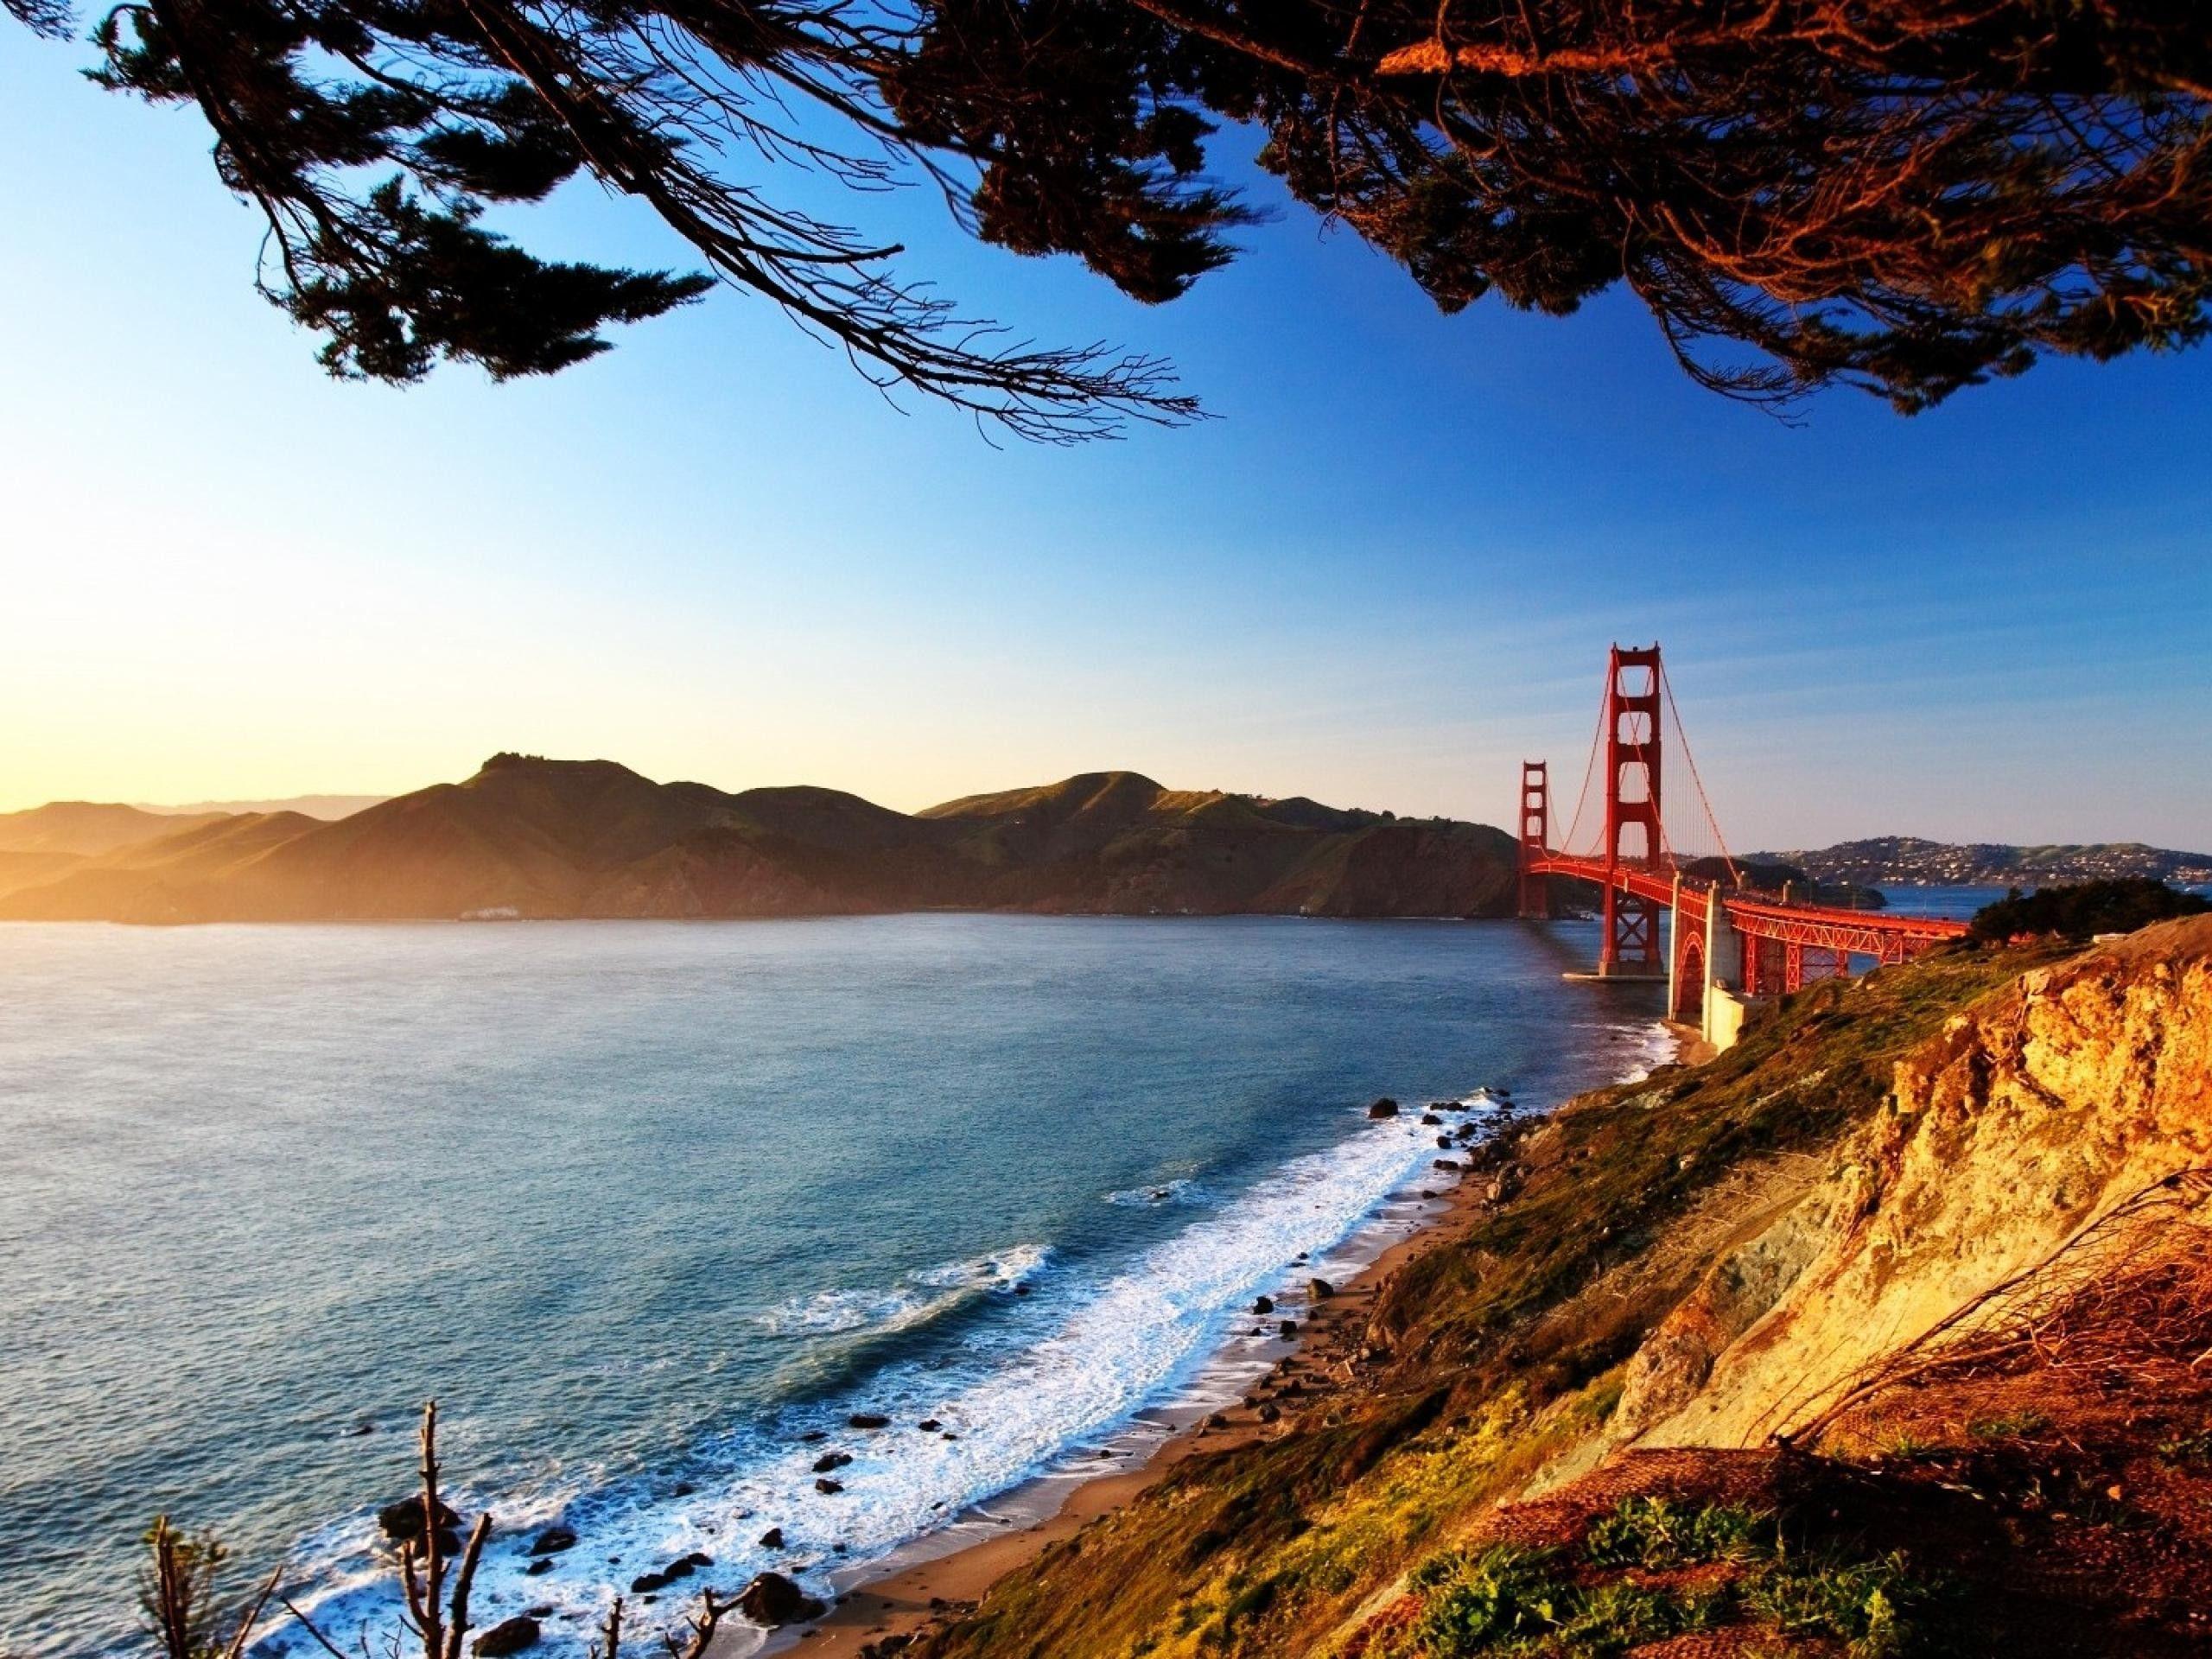 Water Landscapes Nature Sun Bridges Golden Gate Bridge San Francisco Wallpaper San Francisco Golden Gate Bridge San Francisco Bridge San Francisco Wallpaper Golden gate bridge sea coast rocks